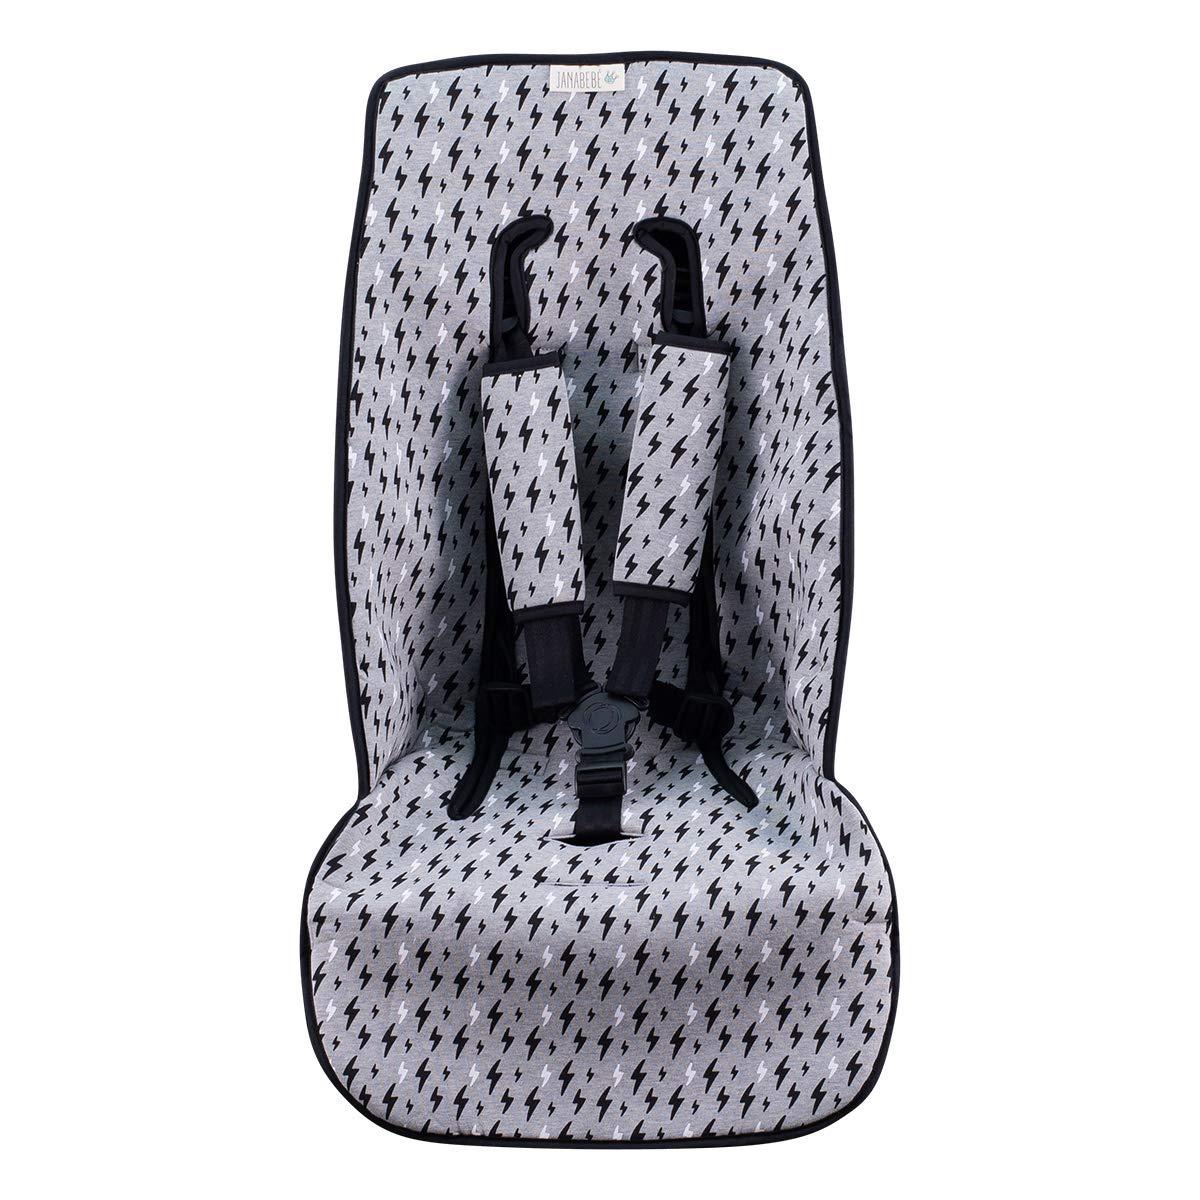 JANABEBE Cover Pushchair Luxury Foam Compatible with Inglesina, Cibex, Bugaboo (Black Rayo)